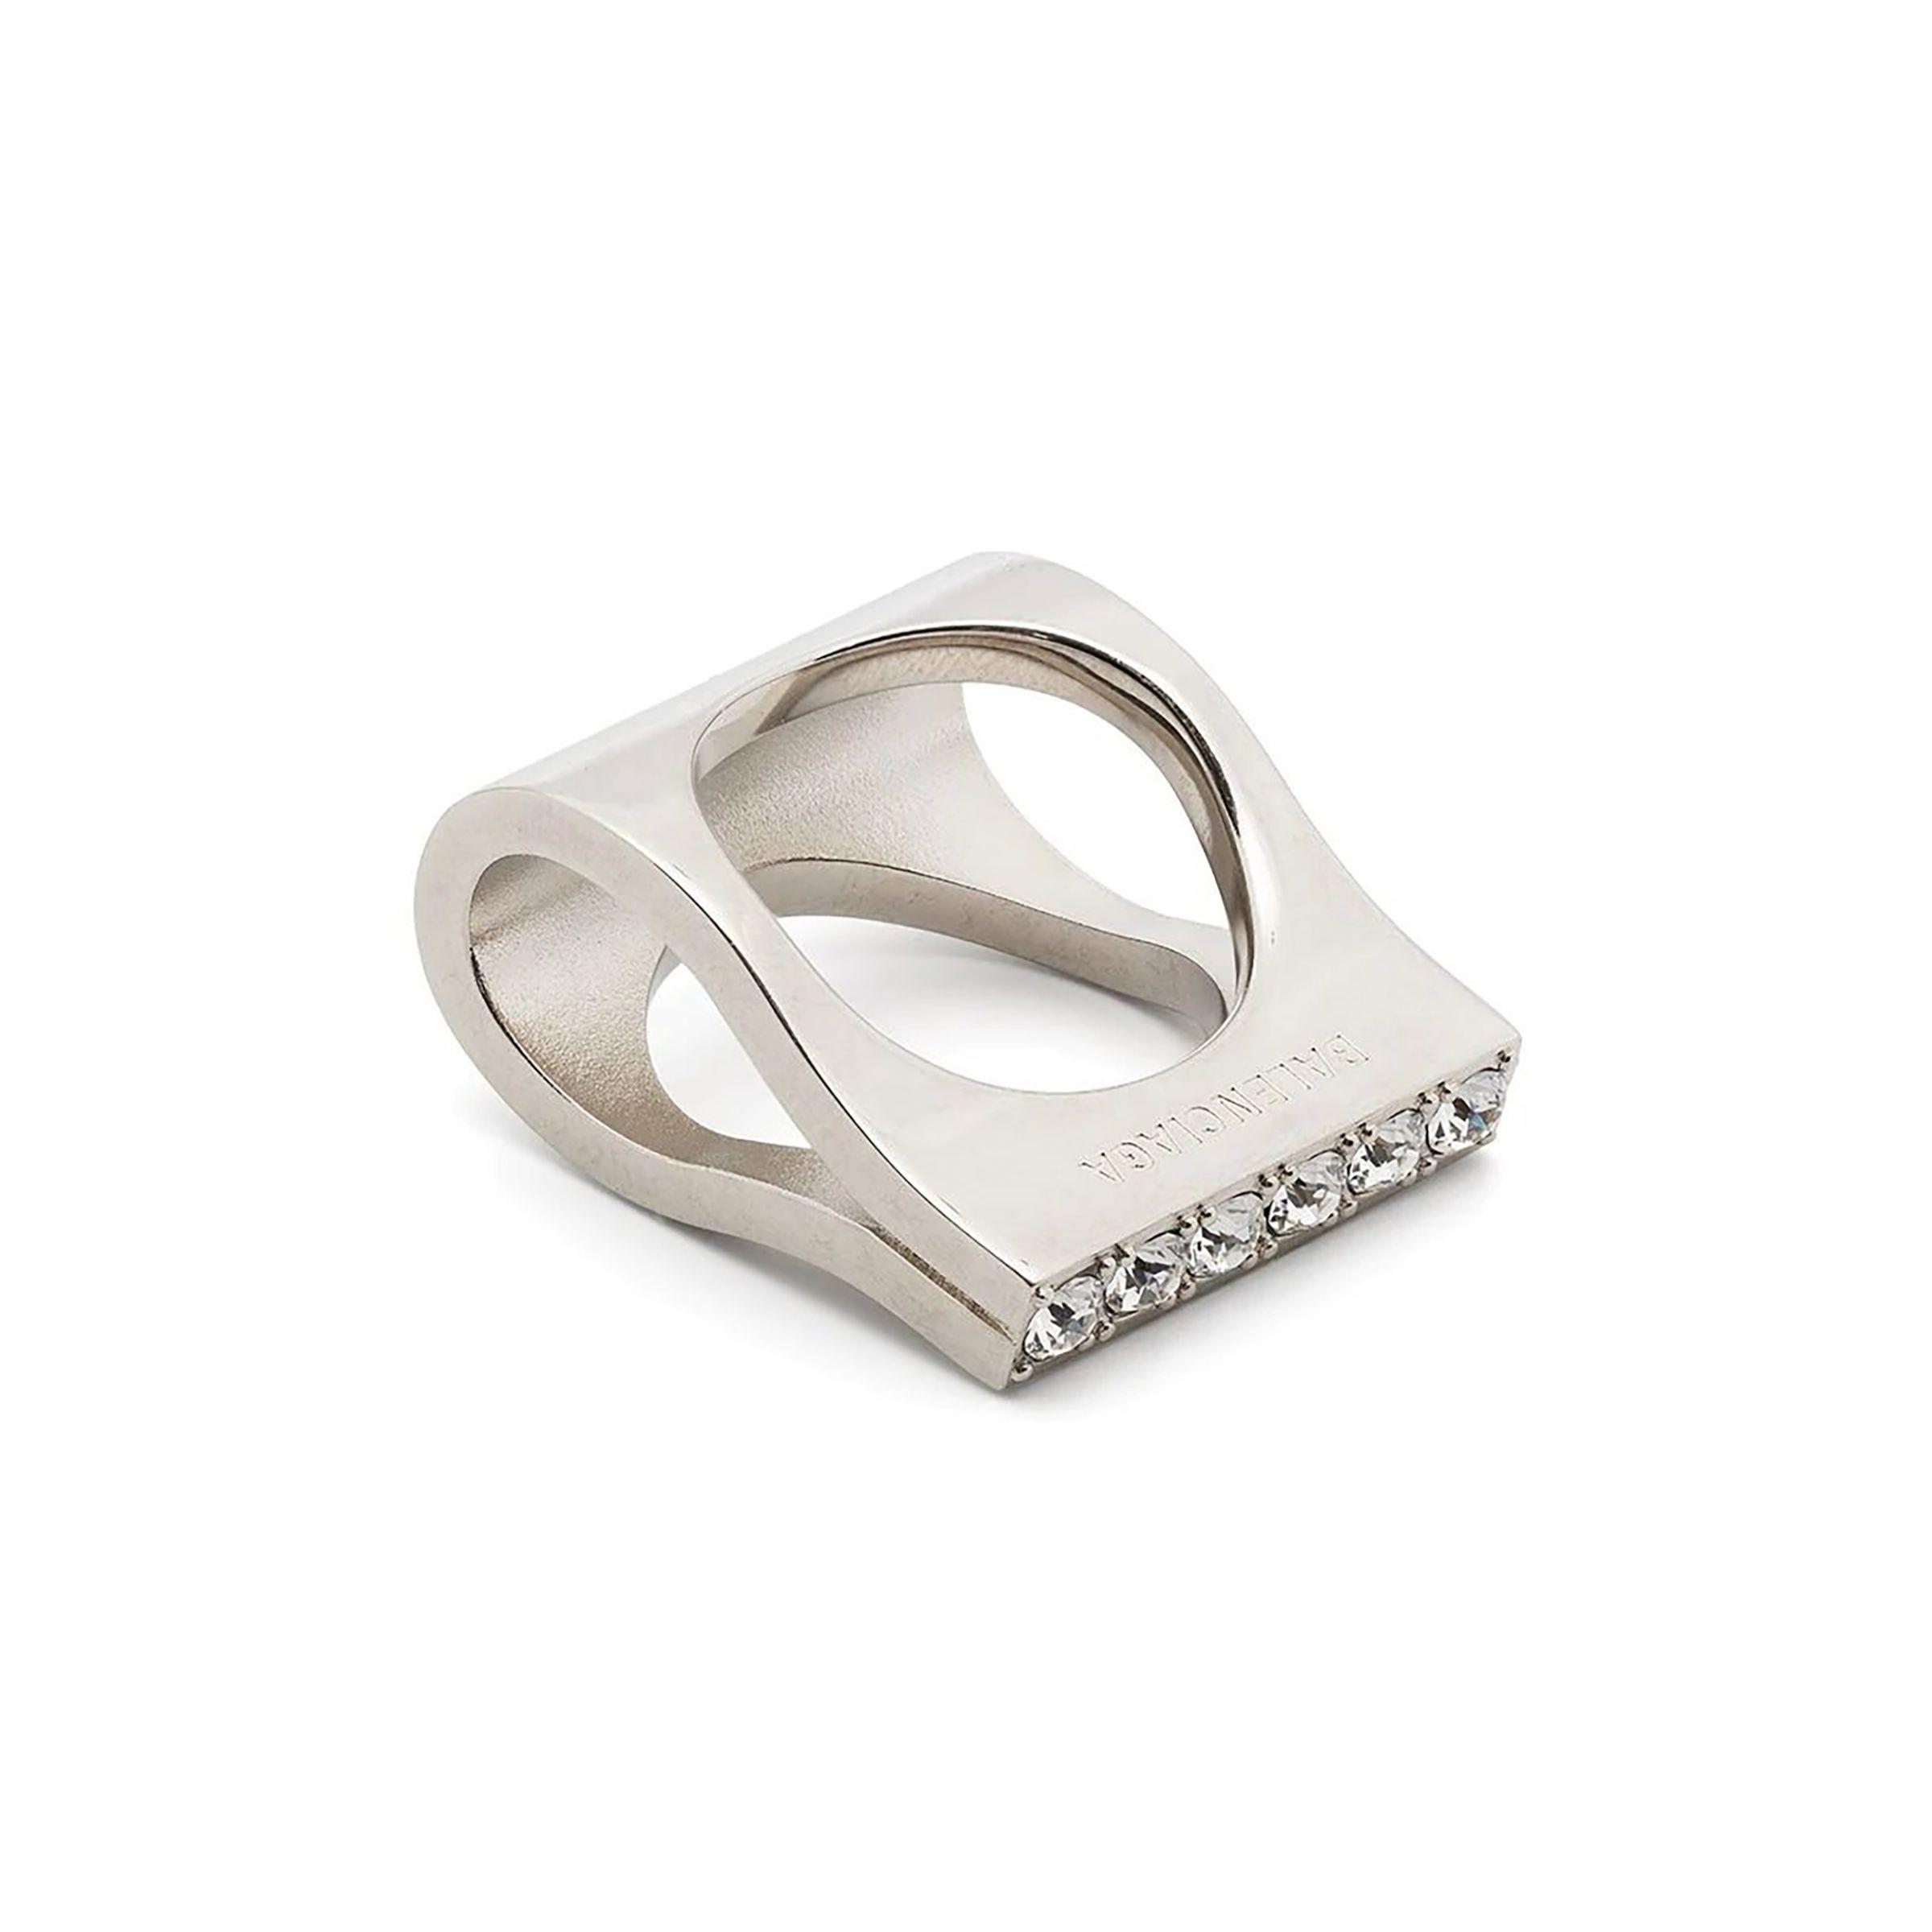 Кольцо Balenciaga BLAZE ROW серебряное